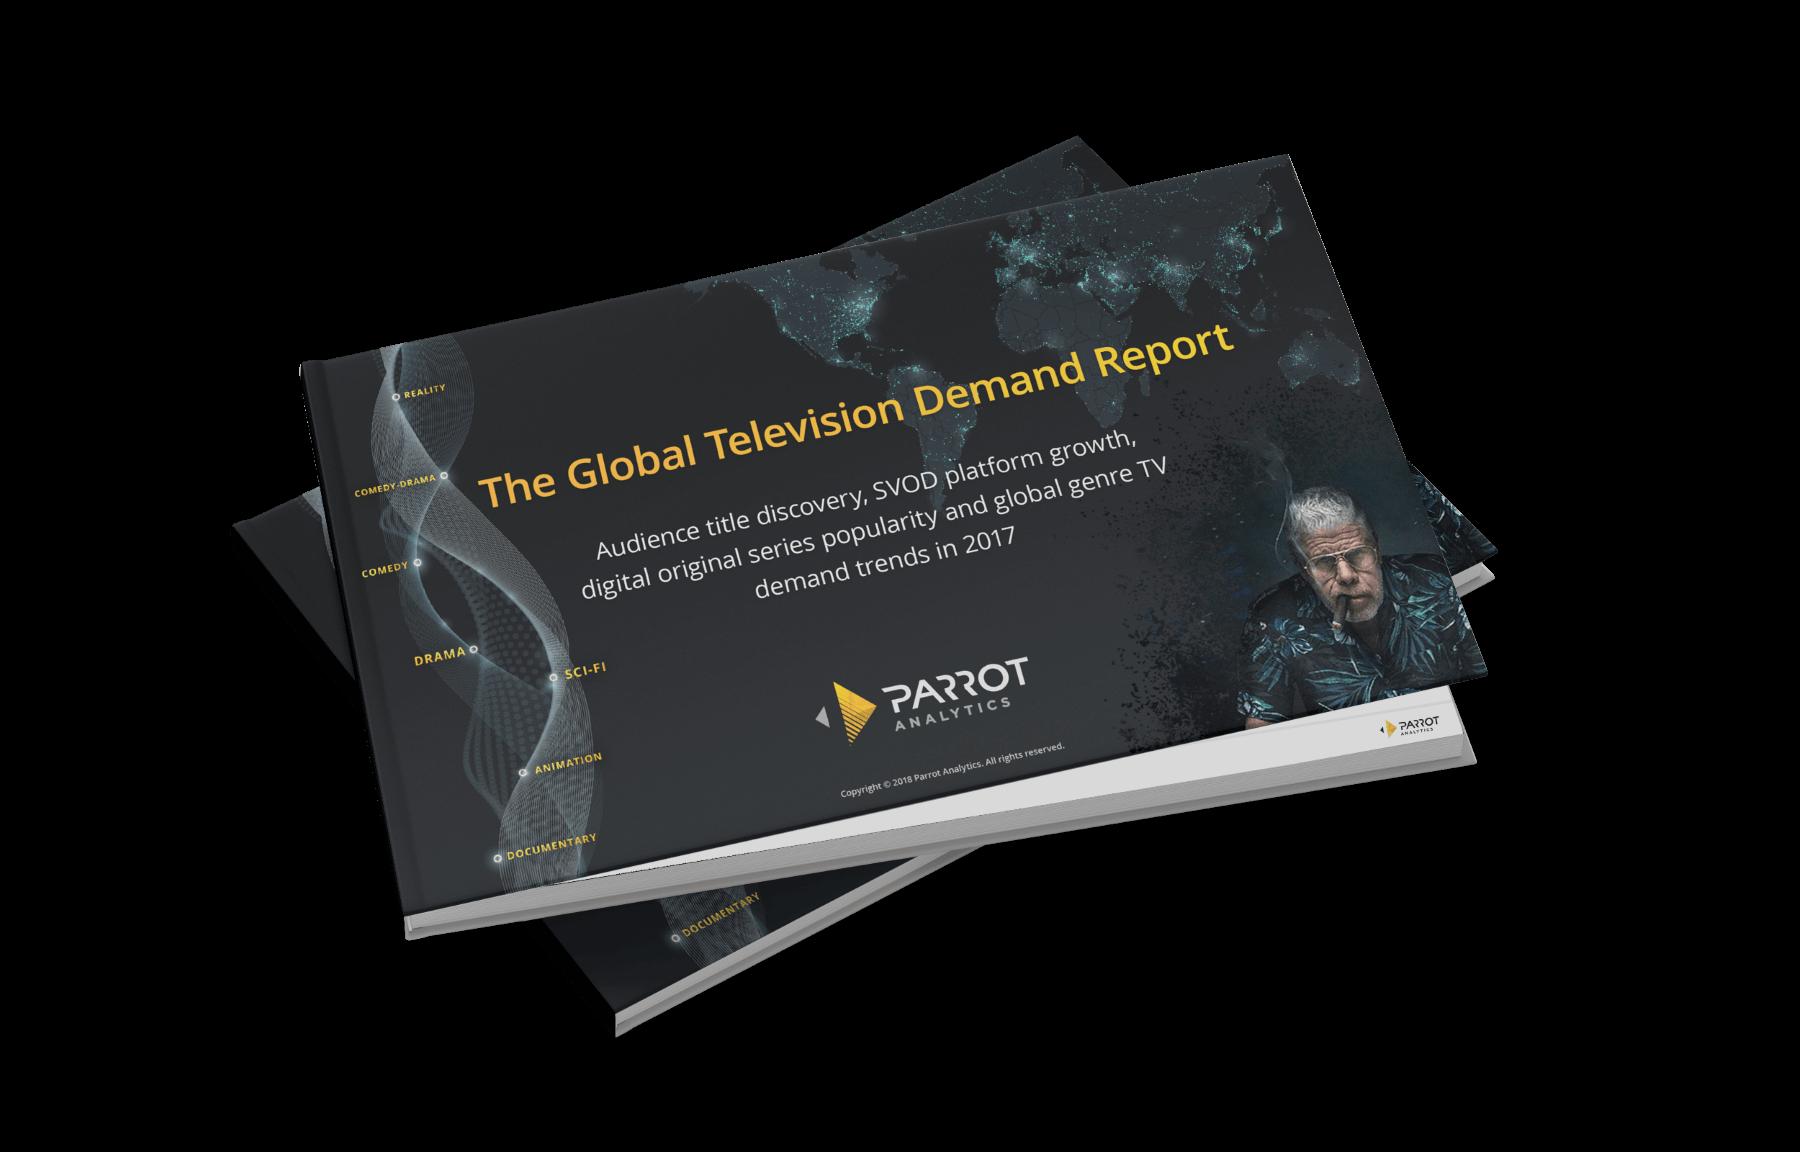 TV Demand Last Week (Feb 23, 2018): The Global Television Demand Report